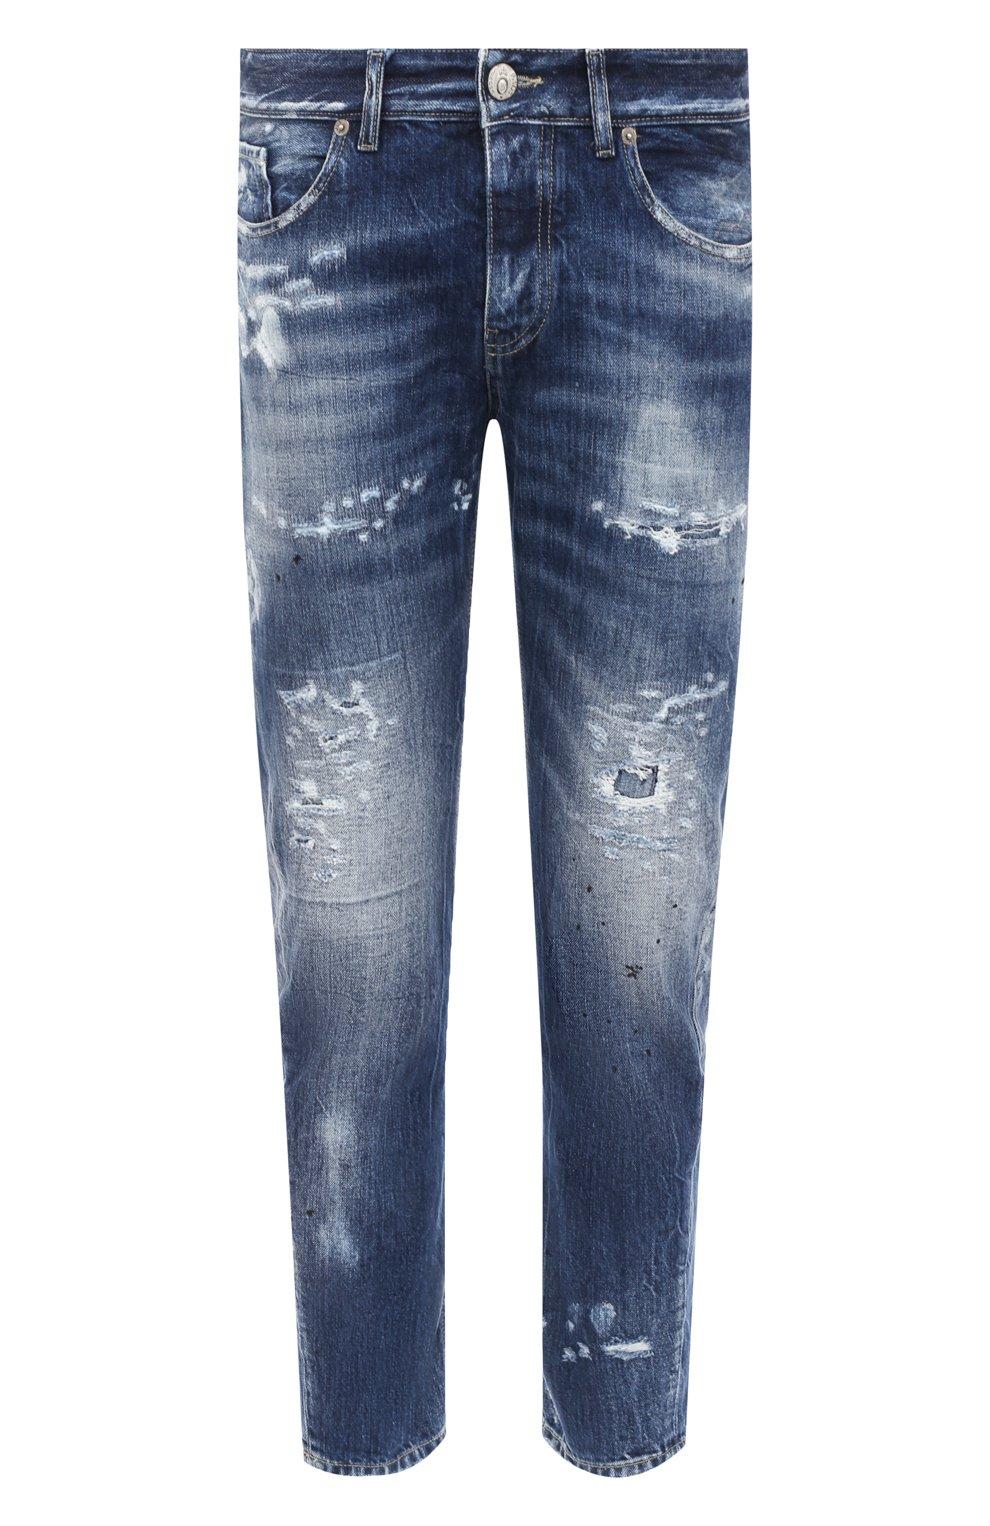 Мужские джинсы PREMIUM MOOD DENIM SUPERIOR синего цвета, арт. F21 352740221/BARRET   Фото 1